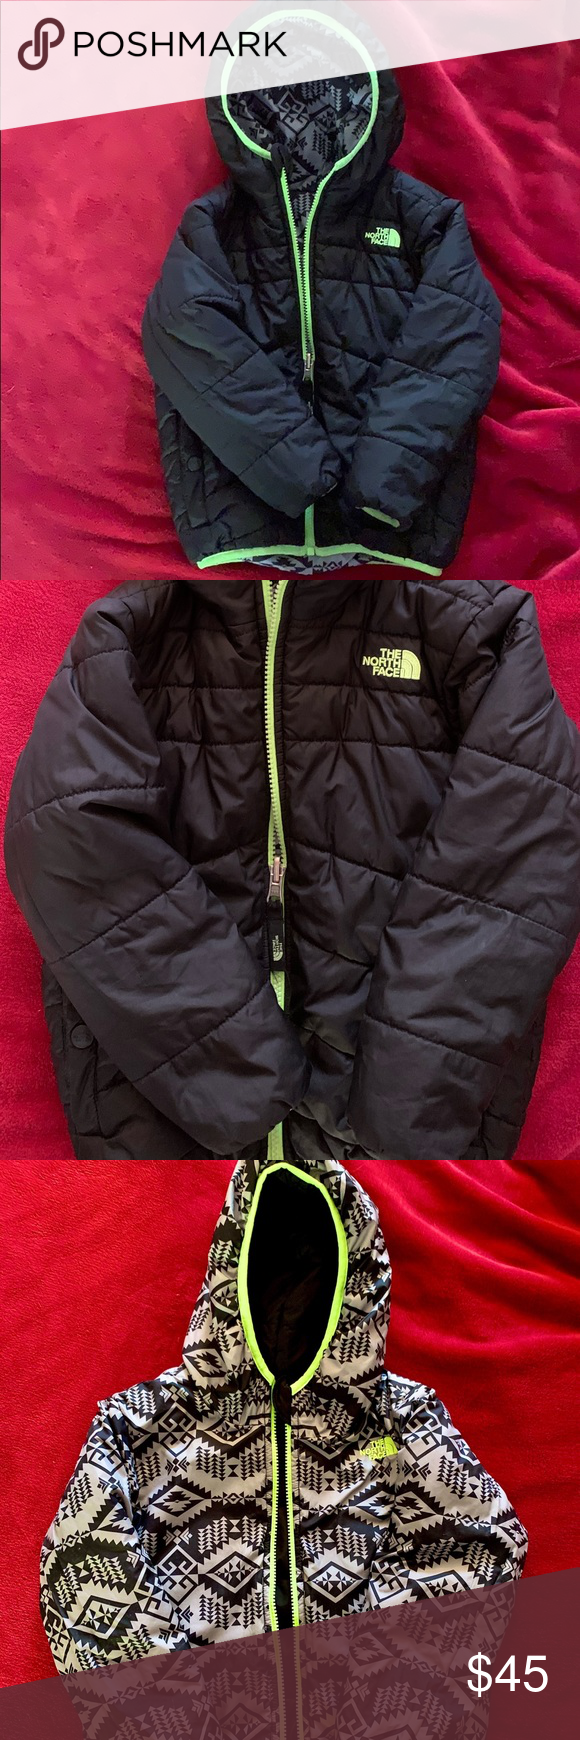 Northface Winter Coat Boys 4t North Face Winter Coat Boys Winter Coats Down Puffer Coat [ 1740 x 580 Pixel ]